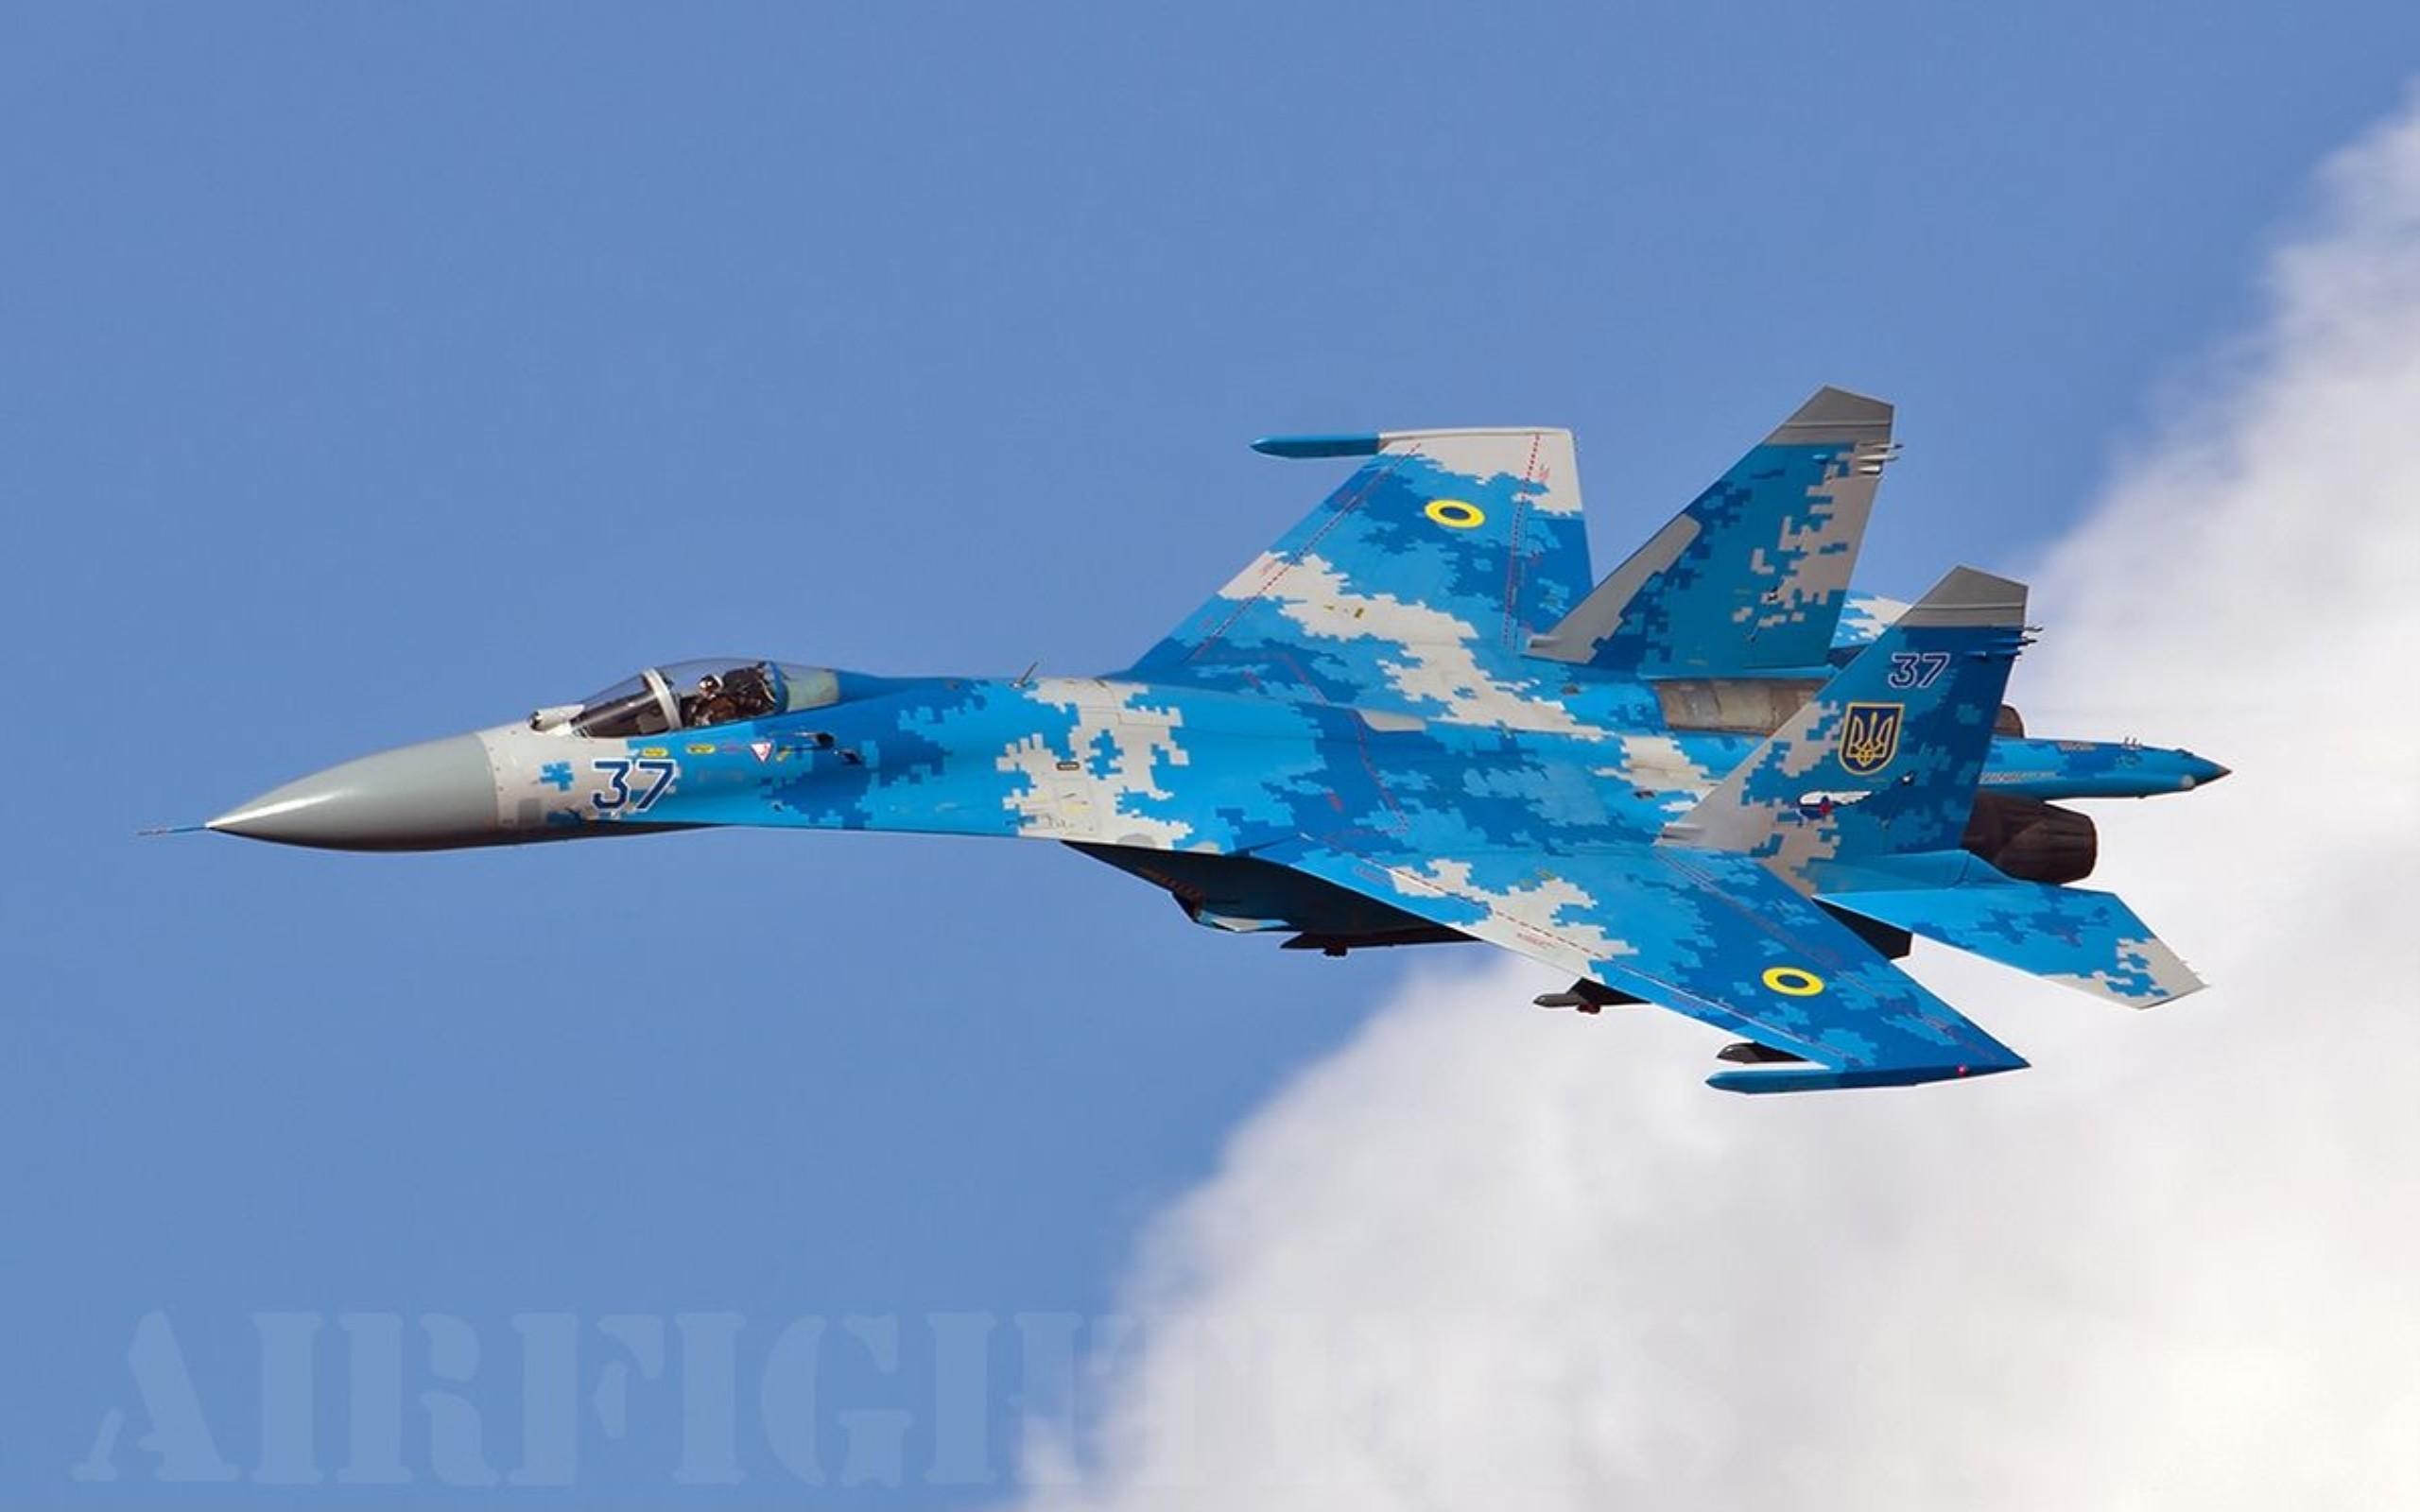 Sukhoi Su-27 (Ukraine Air Force)